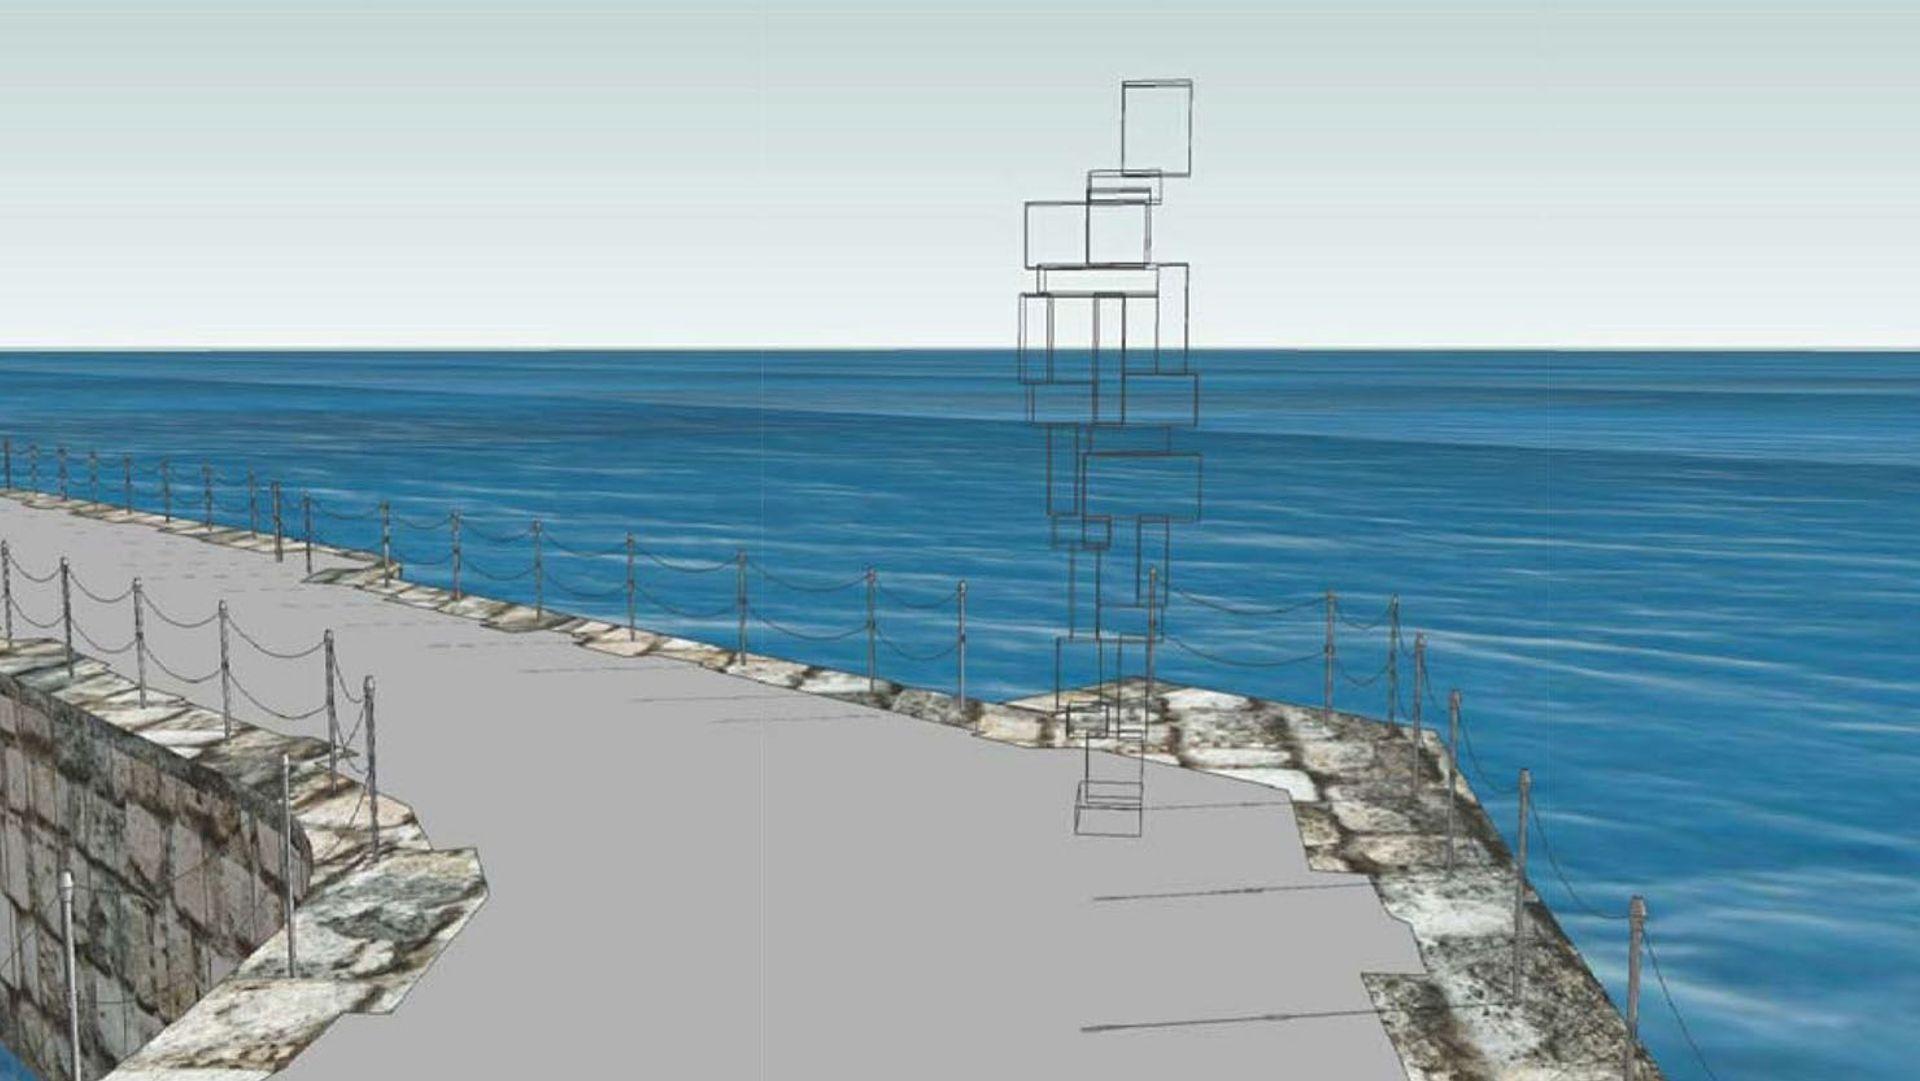 A digital rendering of Antony Gormley's Look II Courtesy of The Box, Plymouth